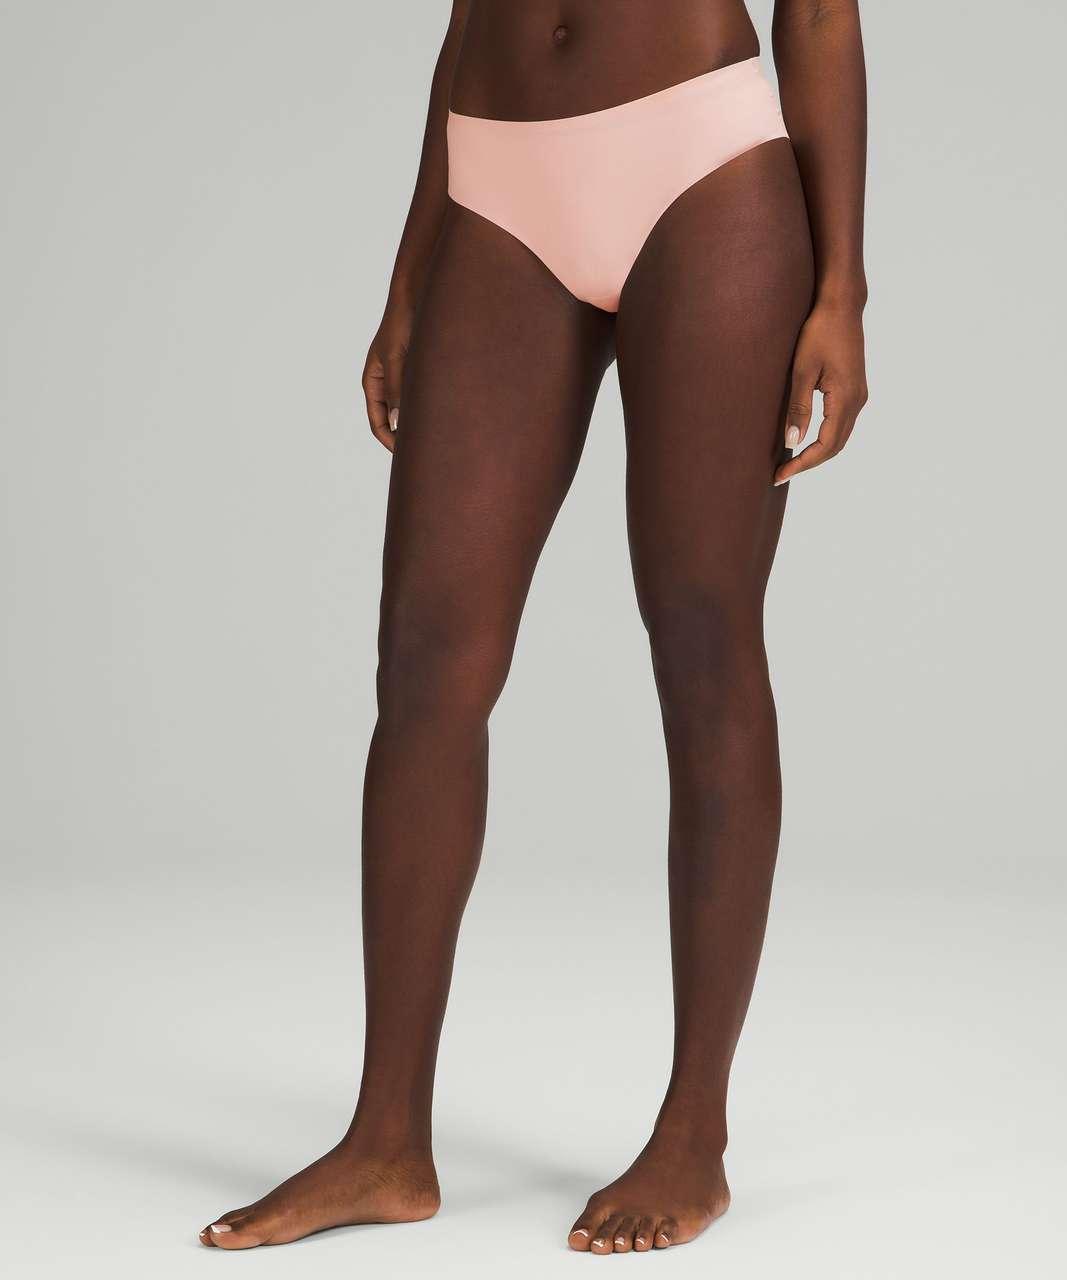 Lululemon InvisiWear Mid Rise Cheeky Bikini Underwear 3 Pack - Heritage 365 Camo Mini Rotated Pecan Tan Multi / Pink Mist / Black